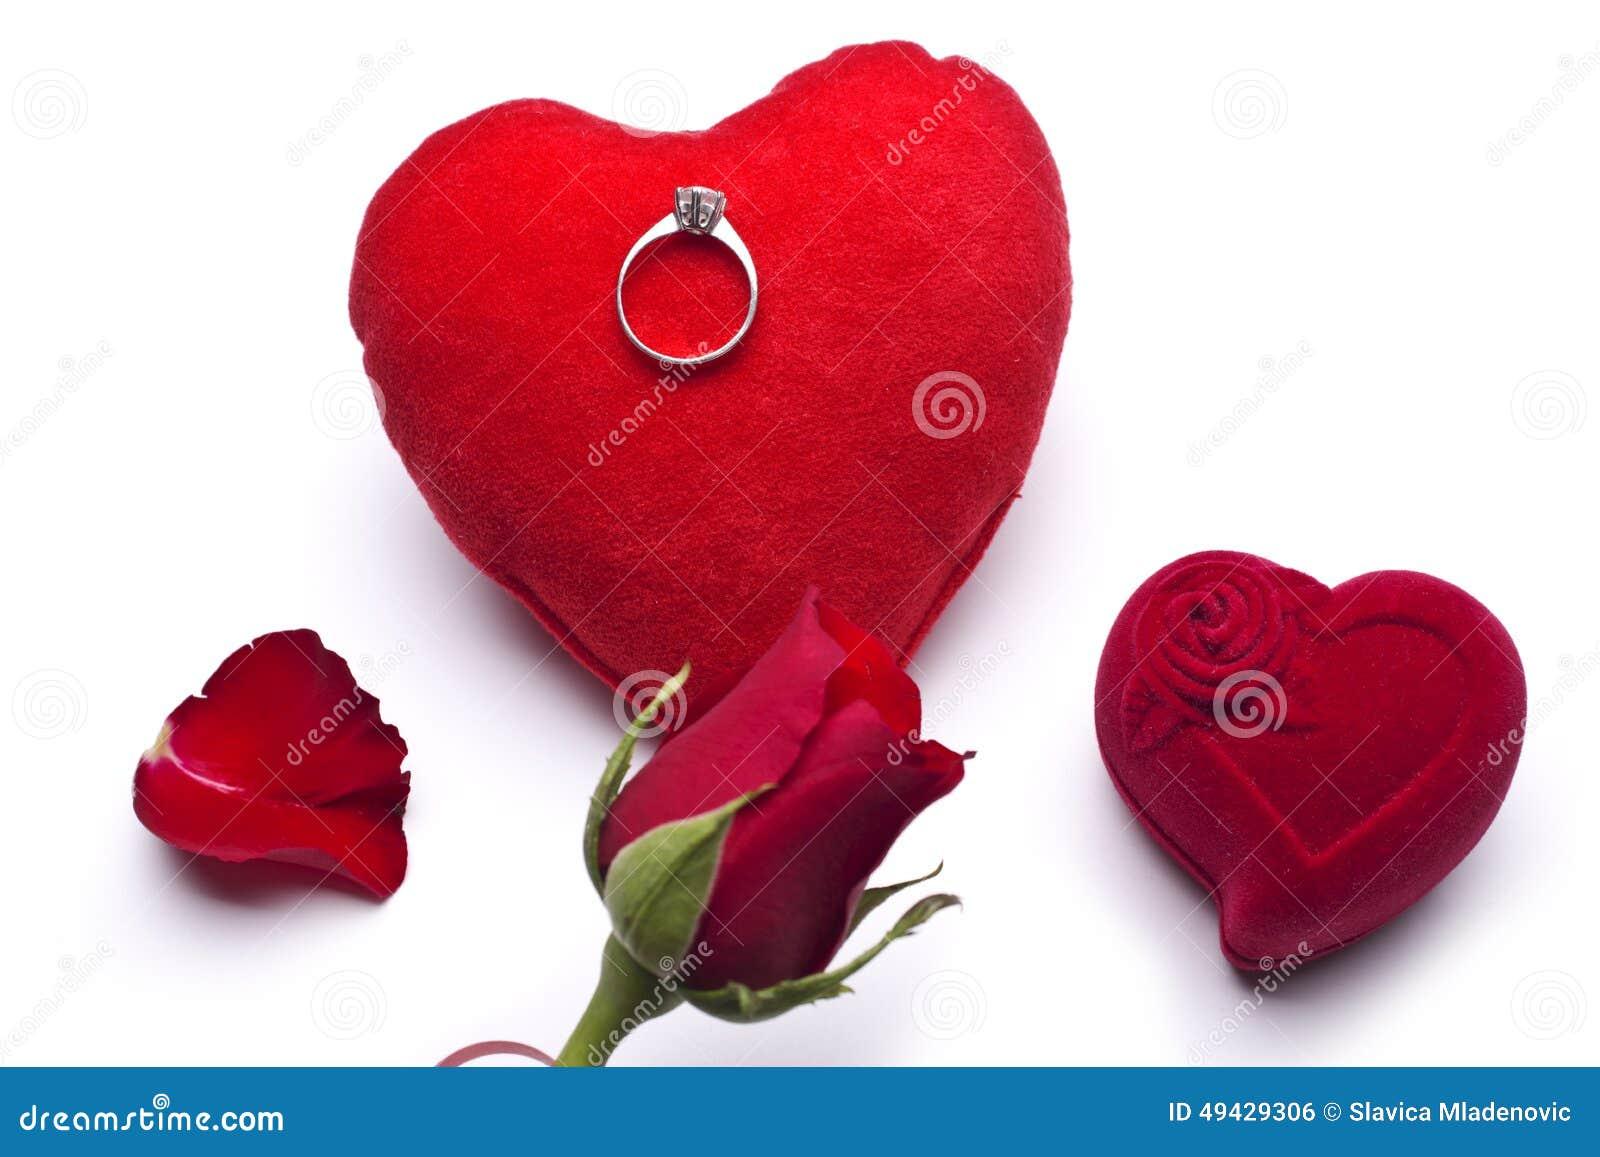 Red Heart Valentine Ring